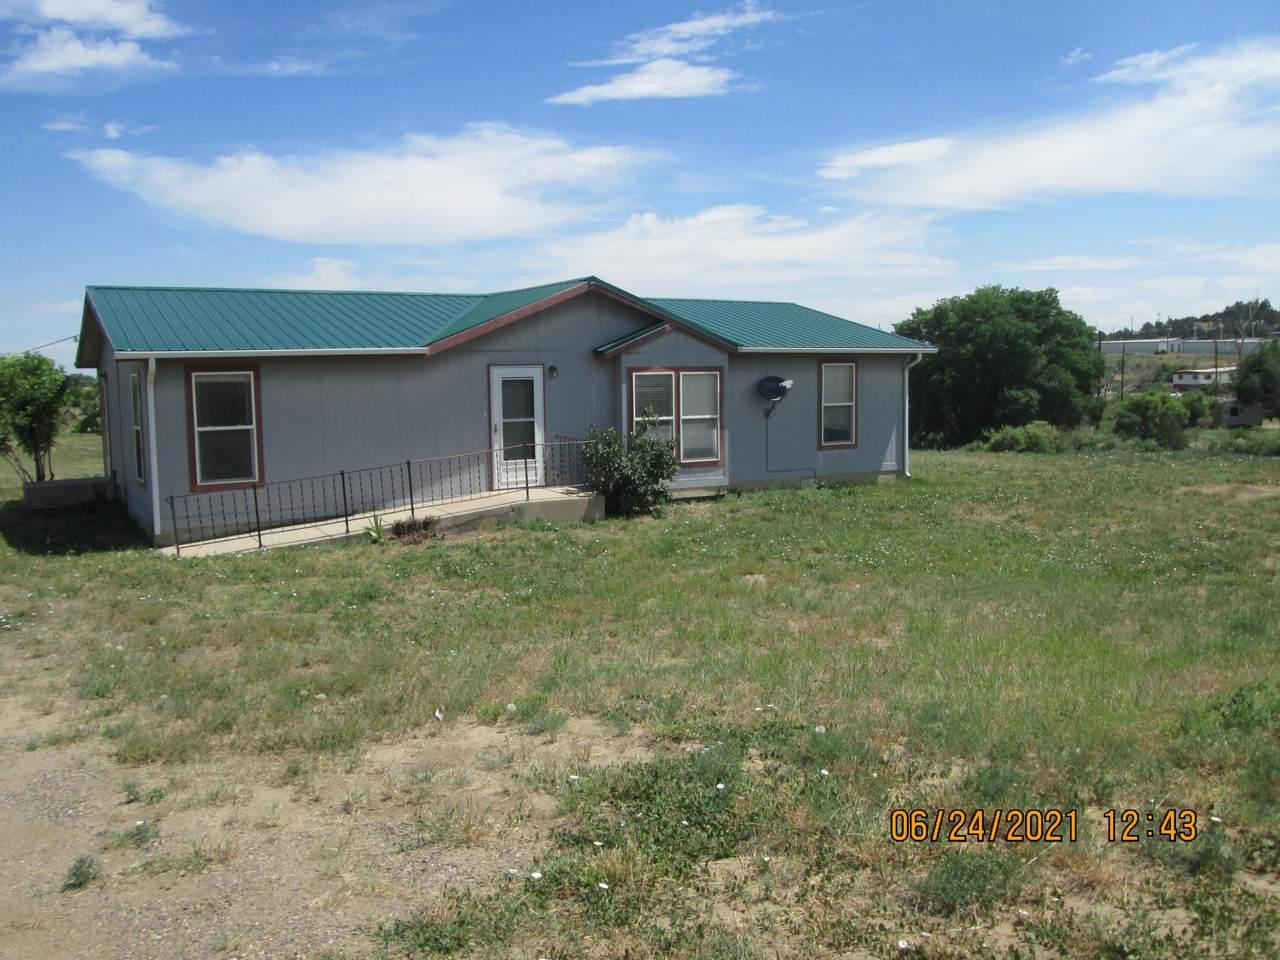 13420 County Rd 73.2 - Photo 1